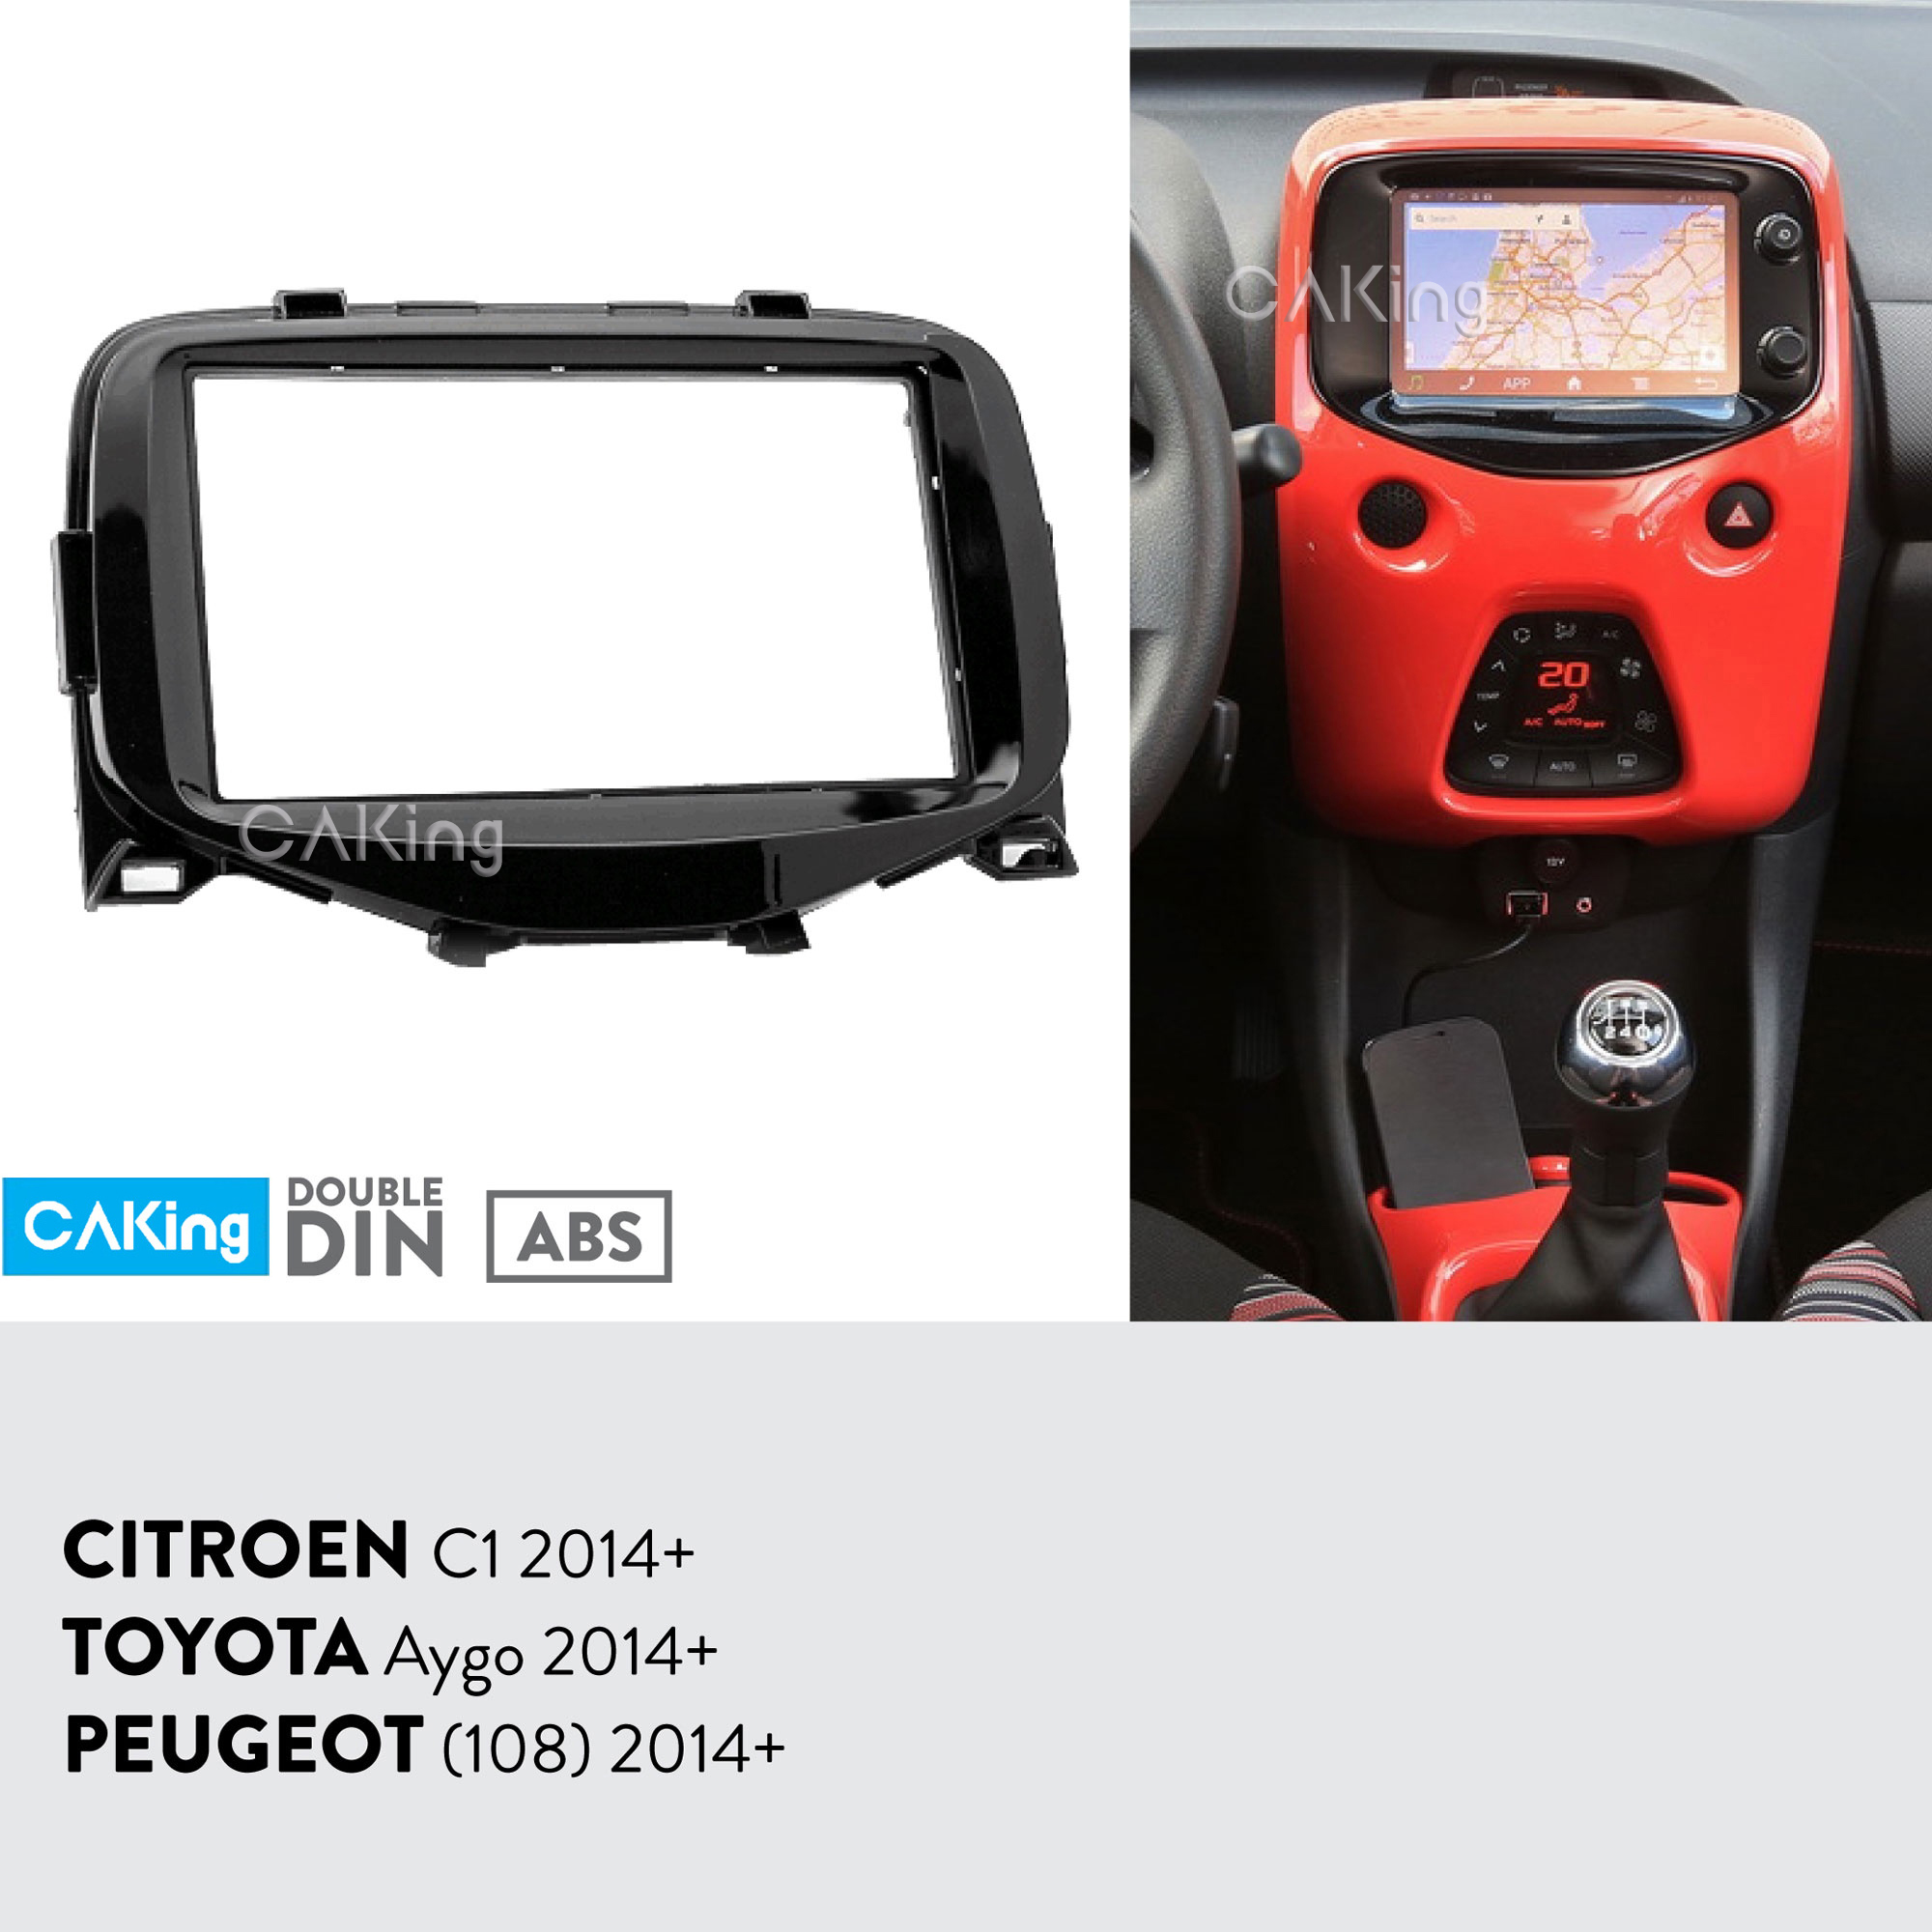 CITROEN C1 PEUGEOT 107 HATCHBACK 2005-2014 REAR TAILGATE BOOT GAS STRUT 8731.L0